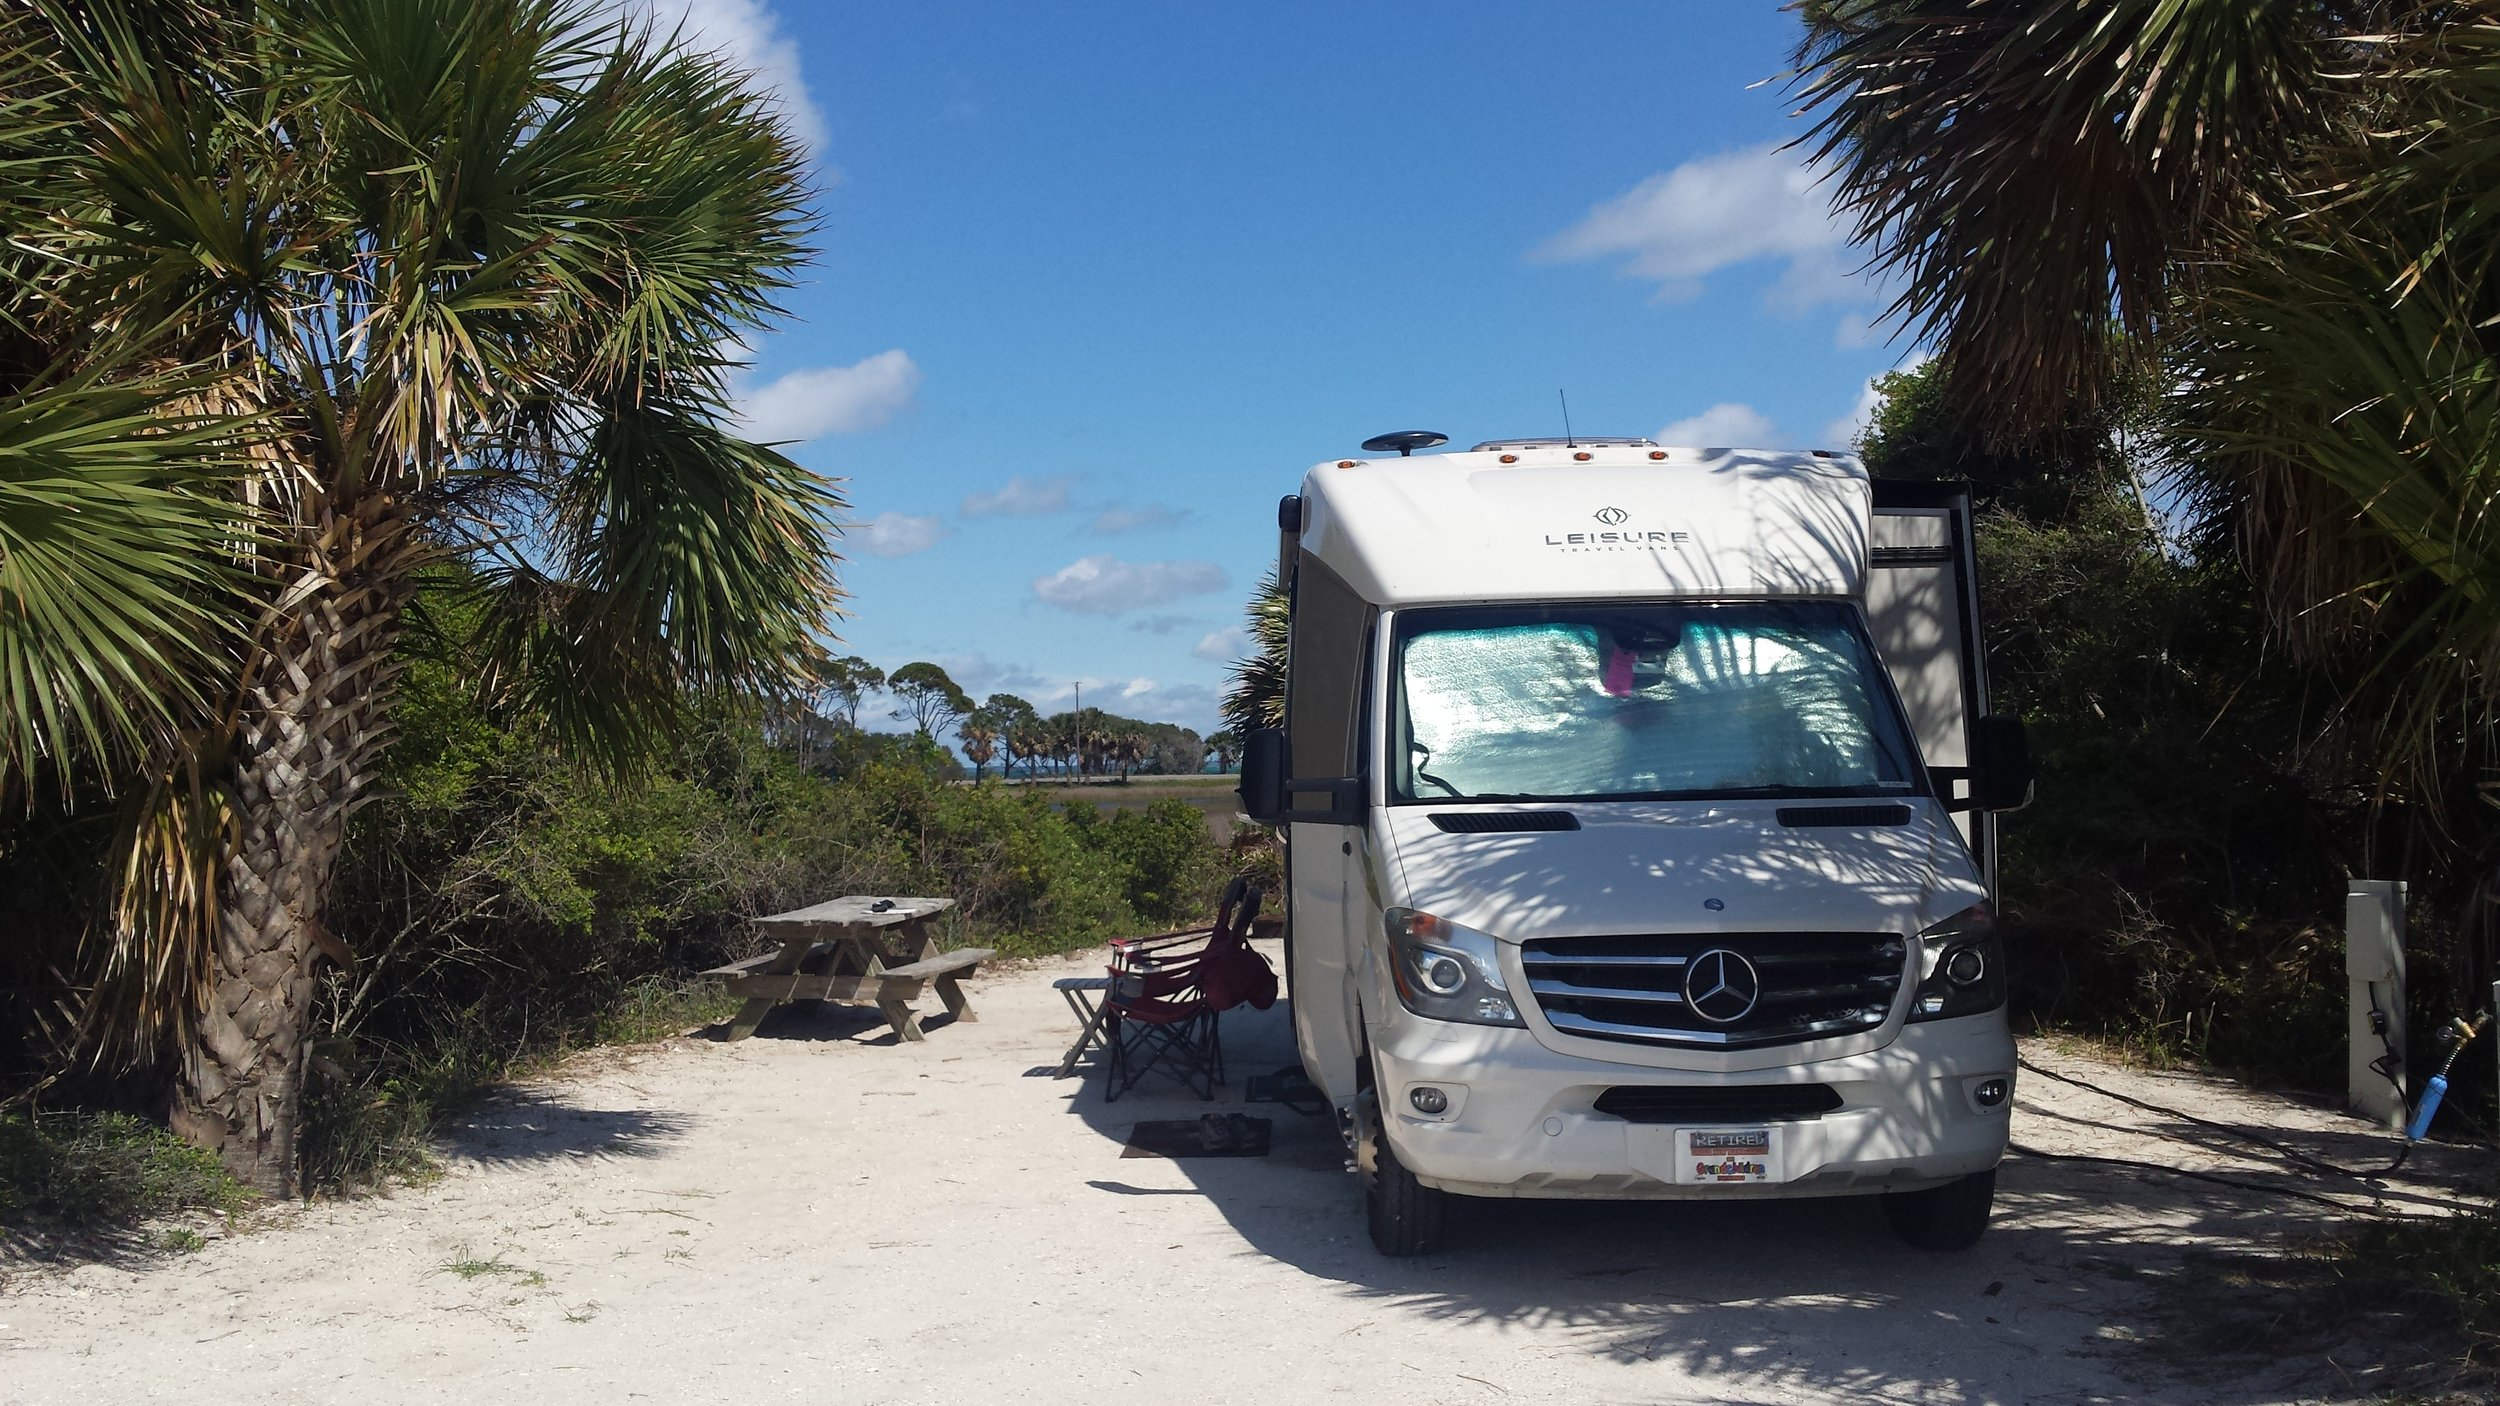 Beach-side campsite at T.H. Stone Memorial St. Joseph Peninsula State Par k